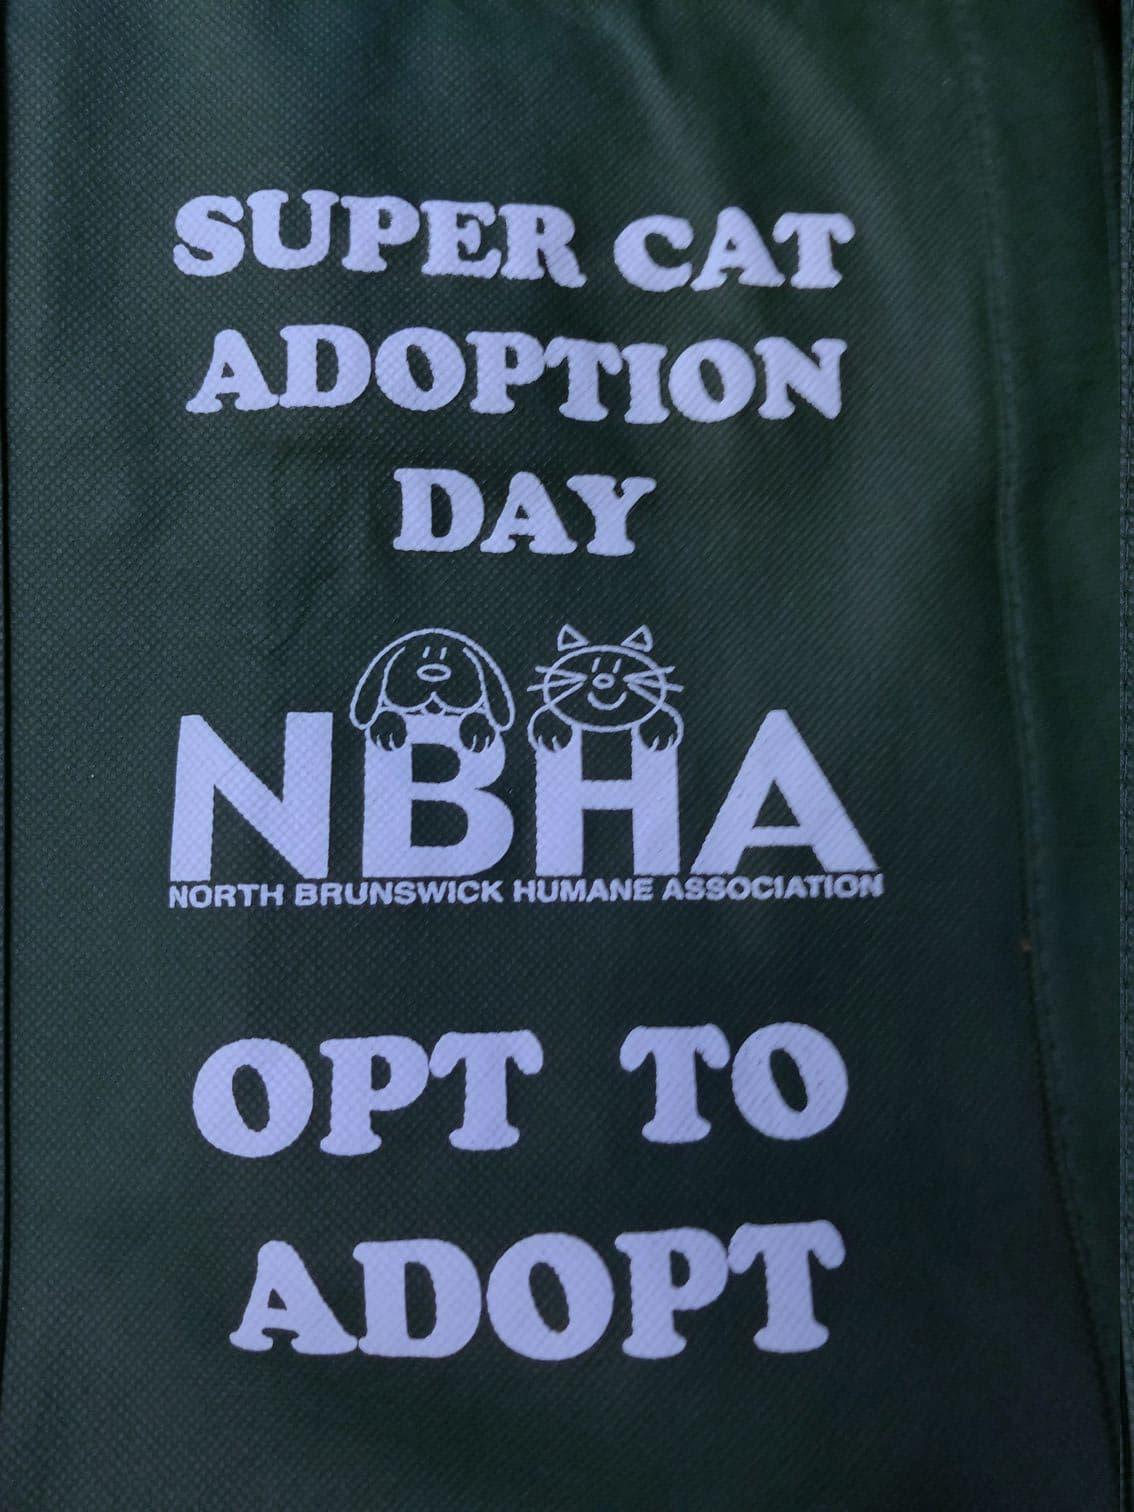 2019 Super Cat Adoption Day Event Gallery North